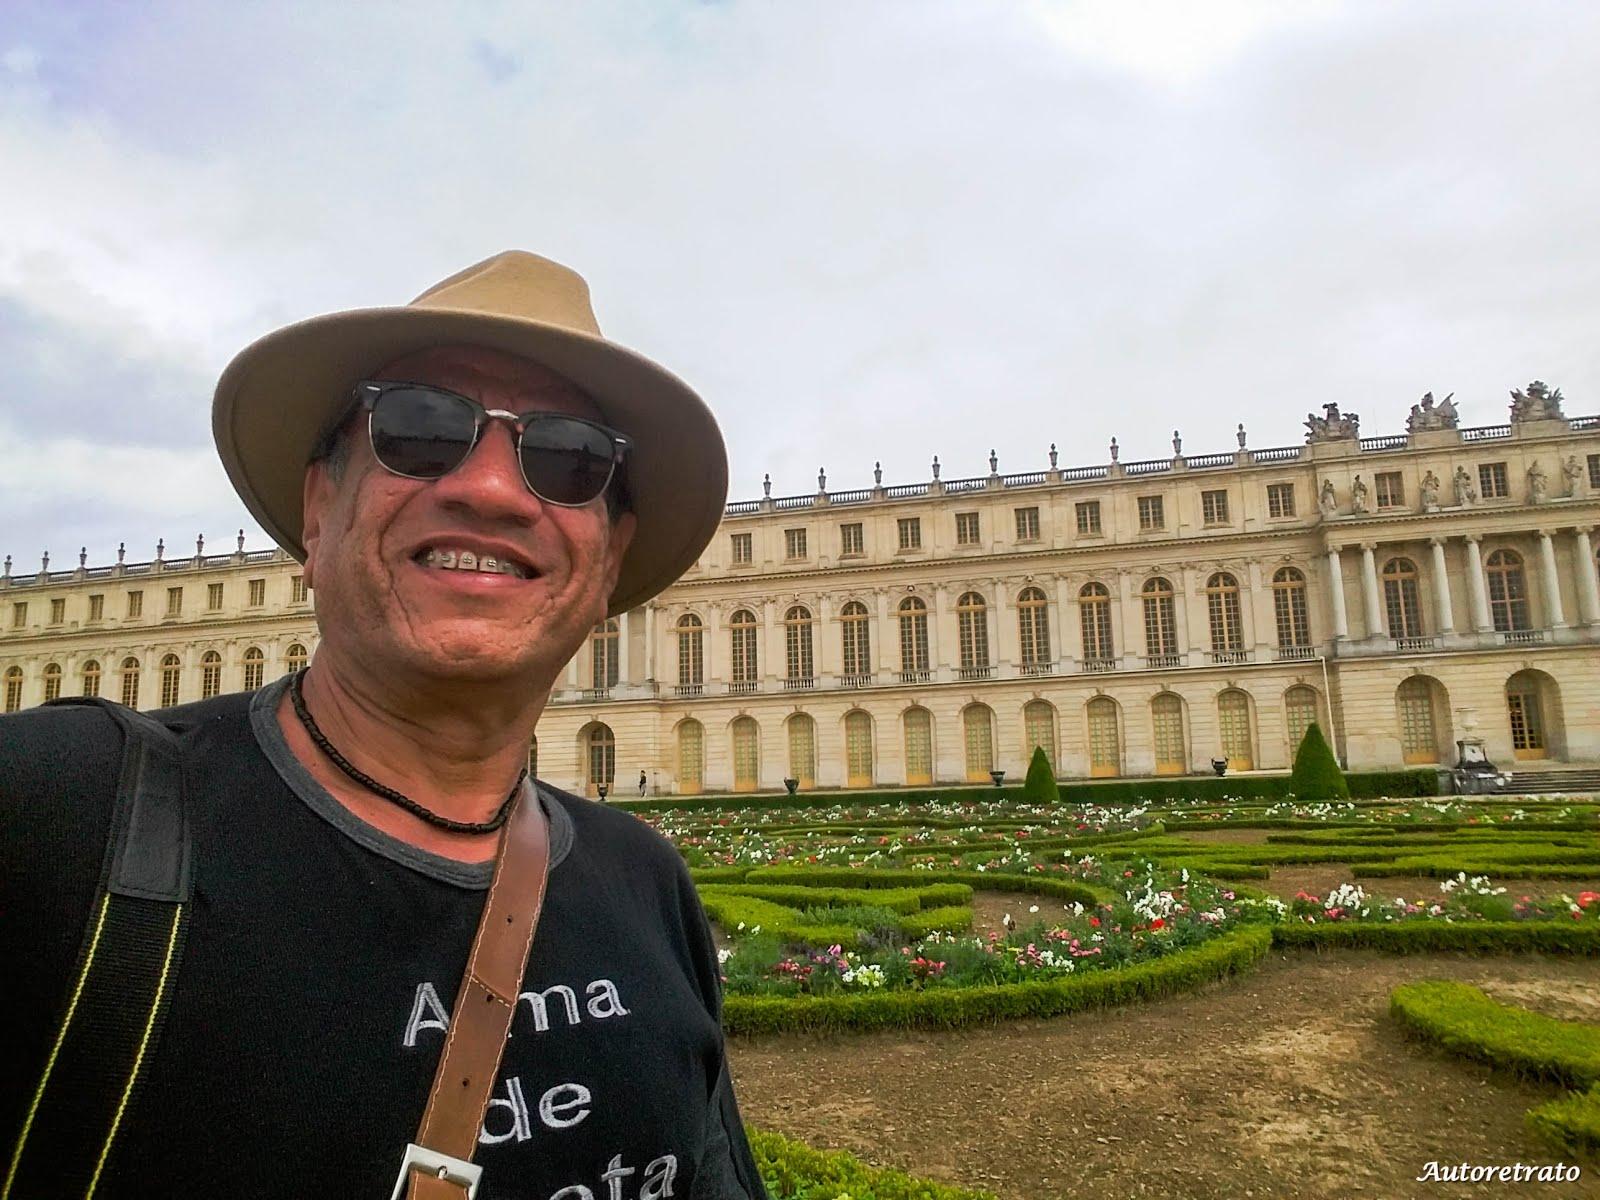 CASTELOS DE VERSALHES - PARIS